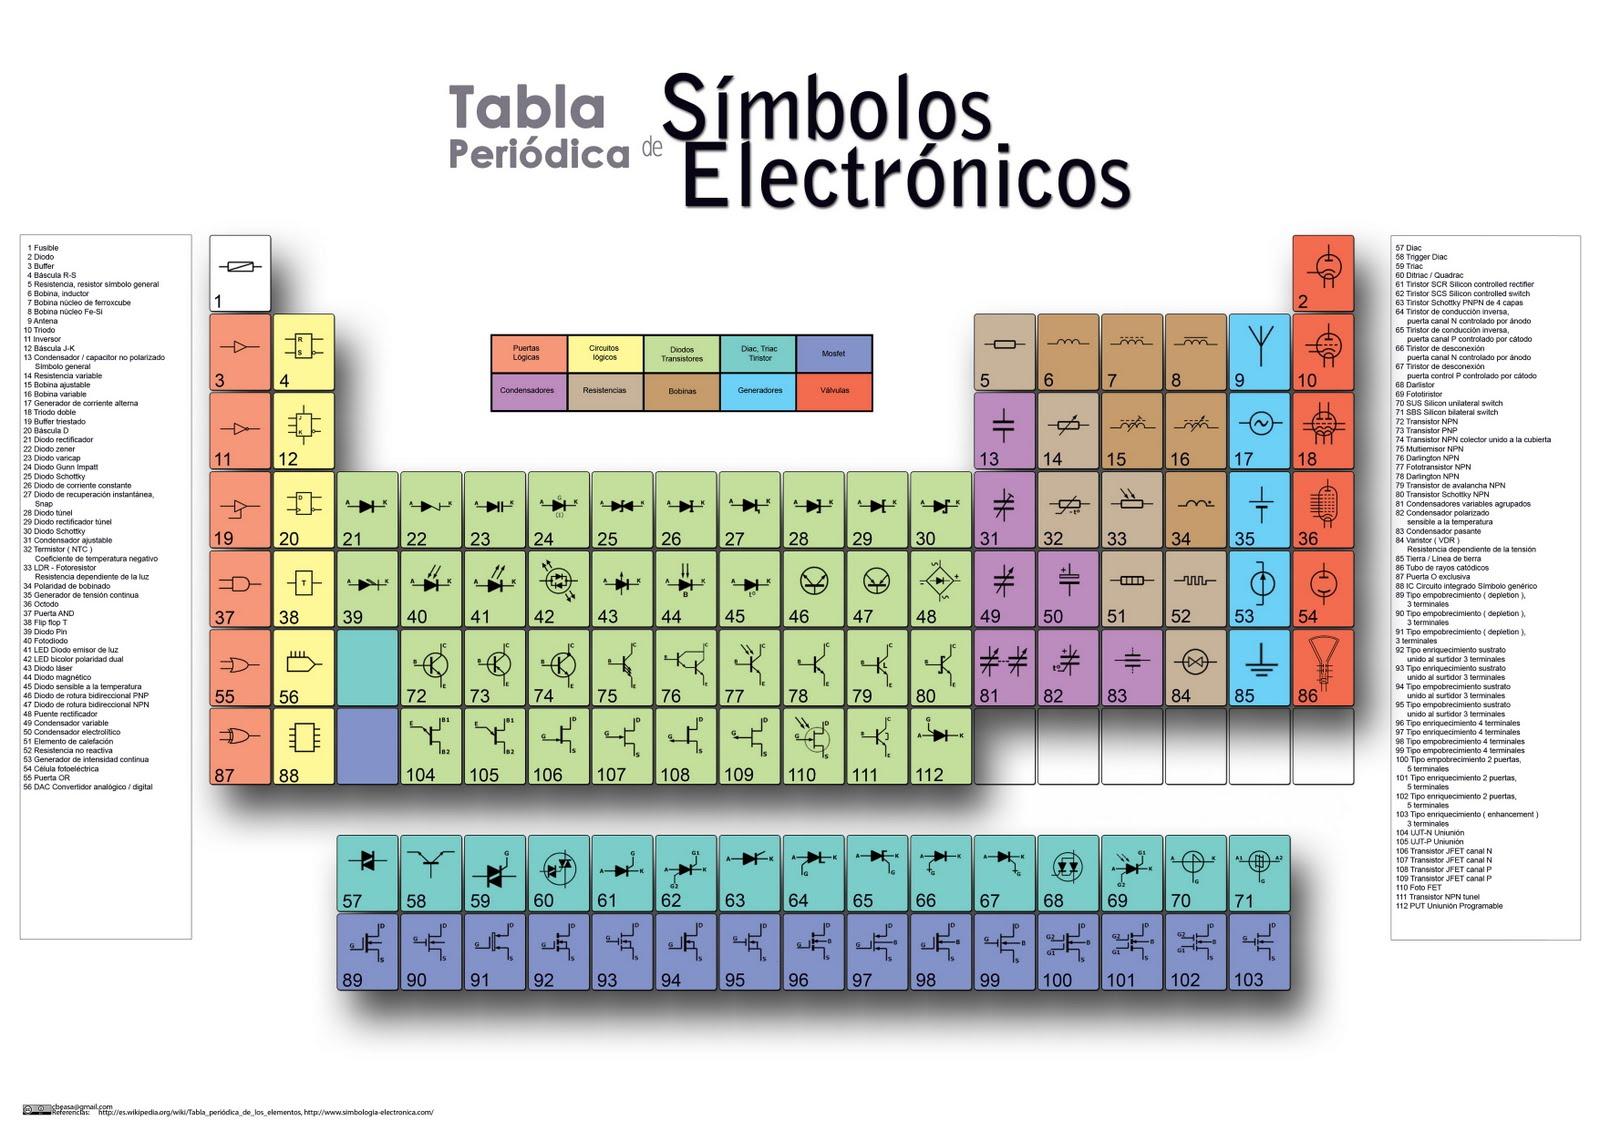 Tabla peridica de los simbolos elctronicos simbolos elctricos urtaz Choice Image